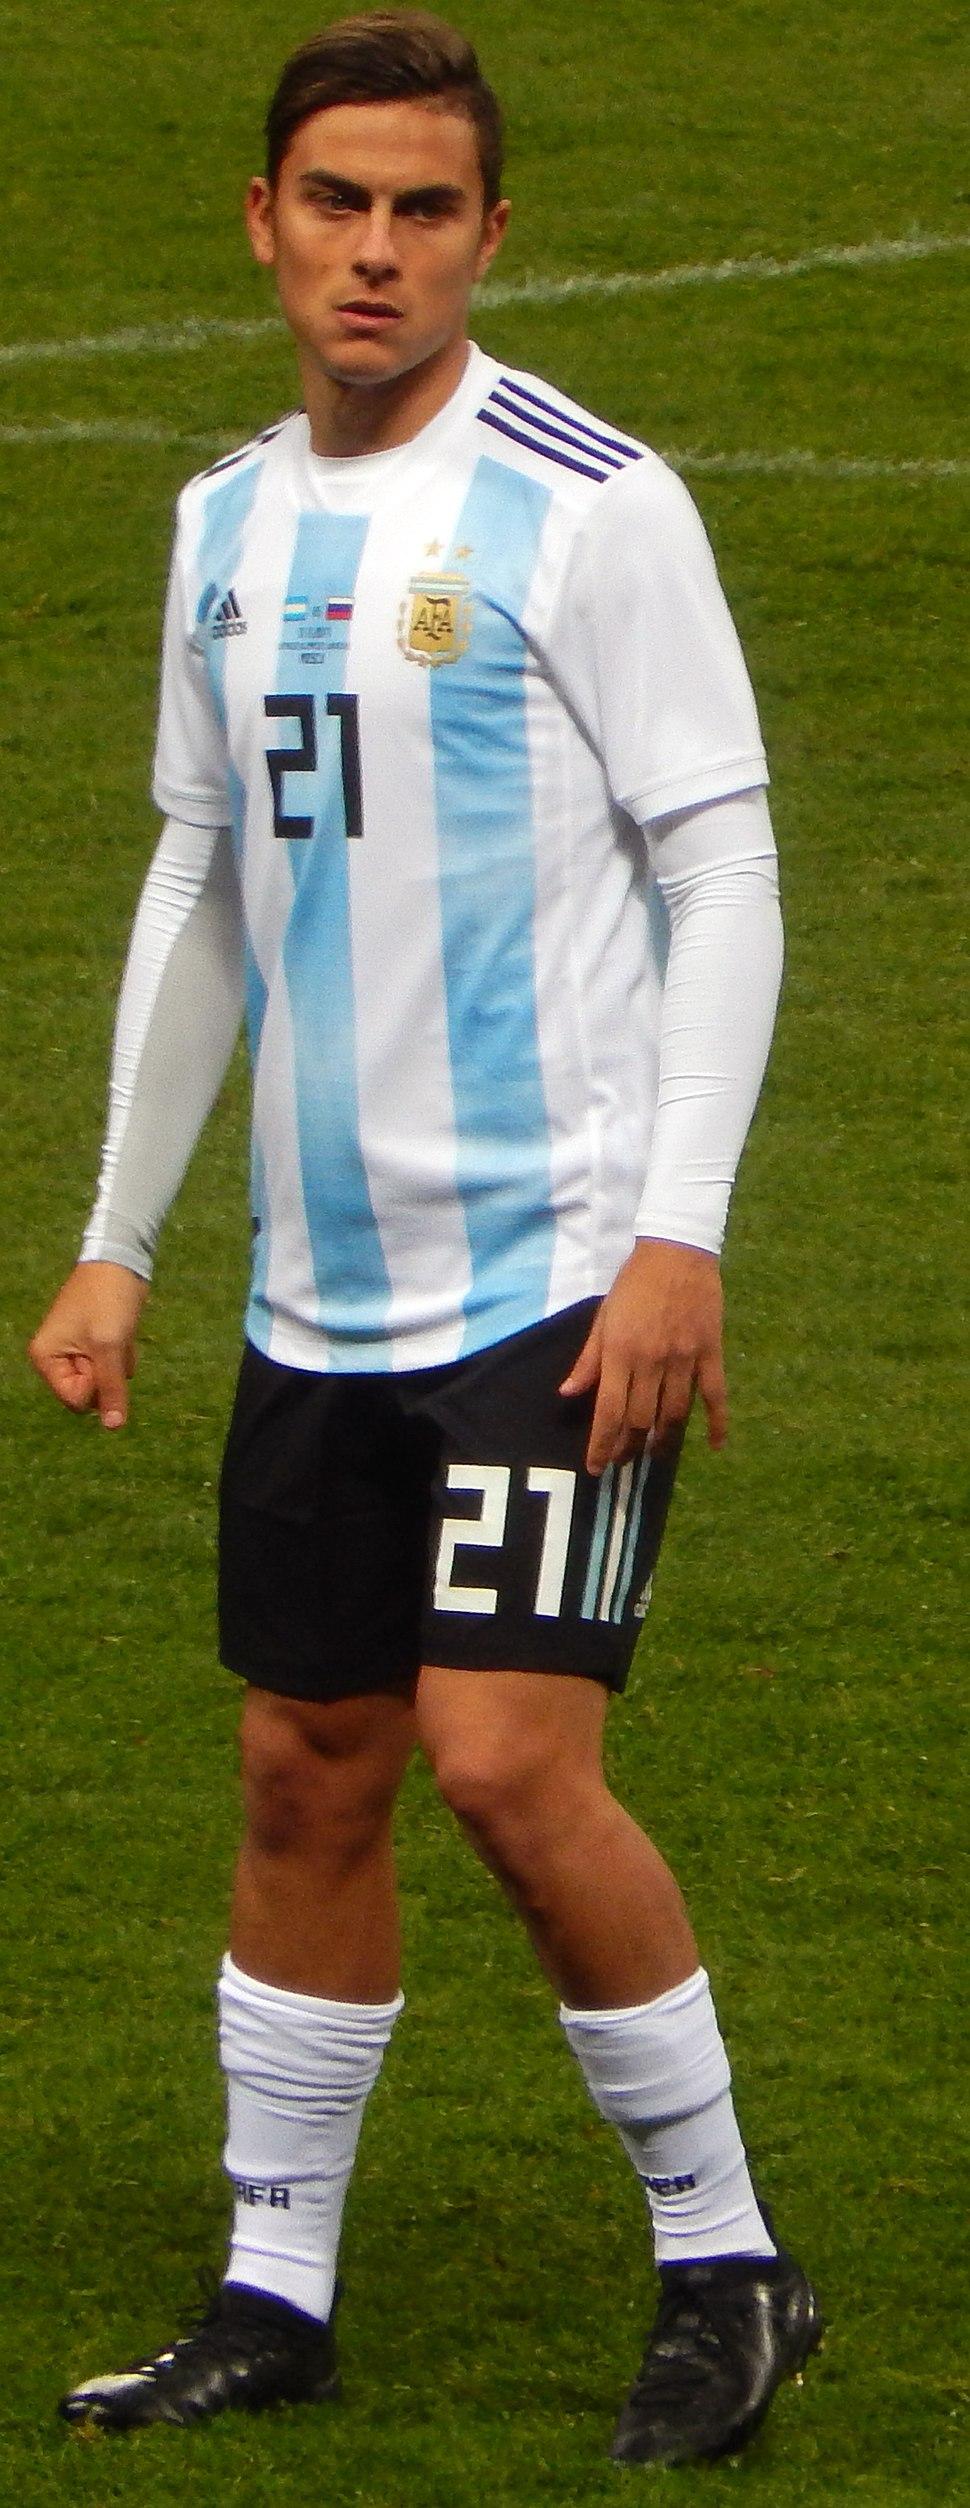 2017 FRIENDLY MATCH RUSSIA v ARGENTINA - Paulo Dybala 02